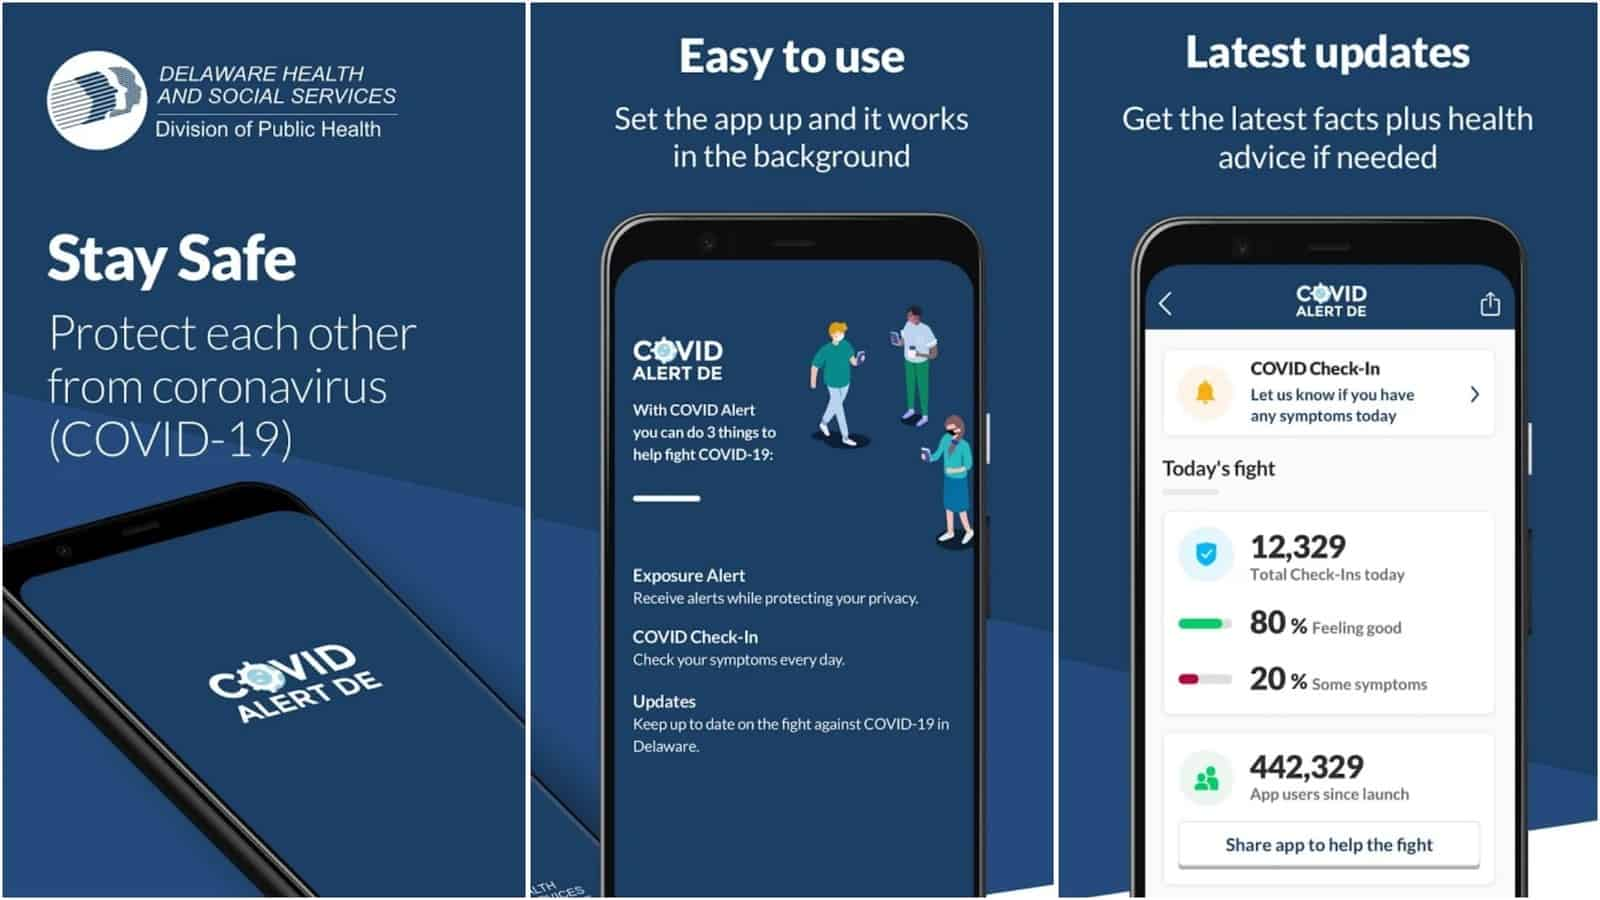 Covid Alert DE app grid image